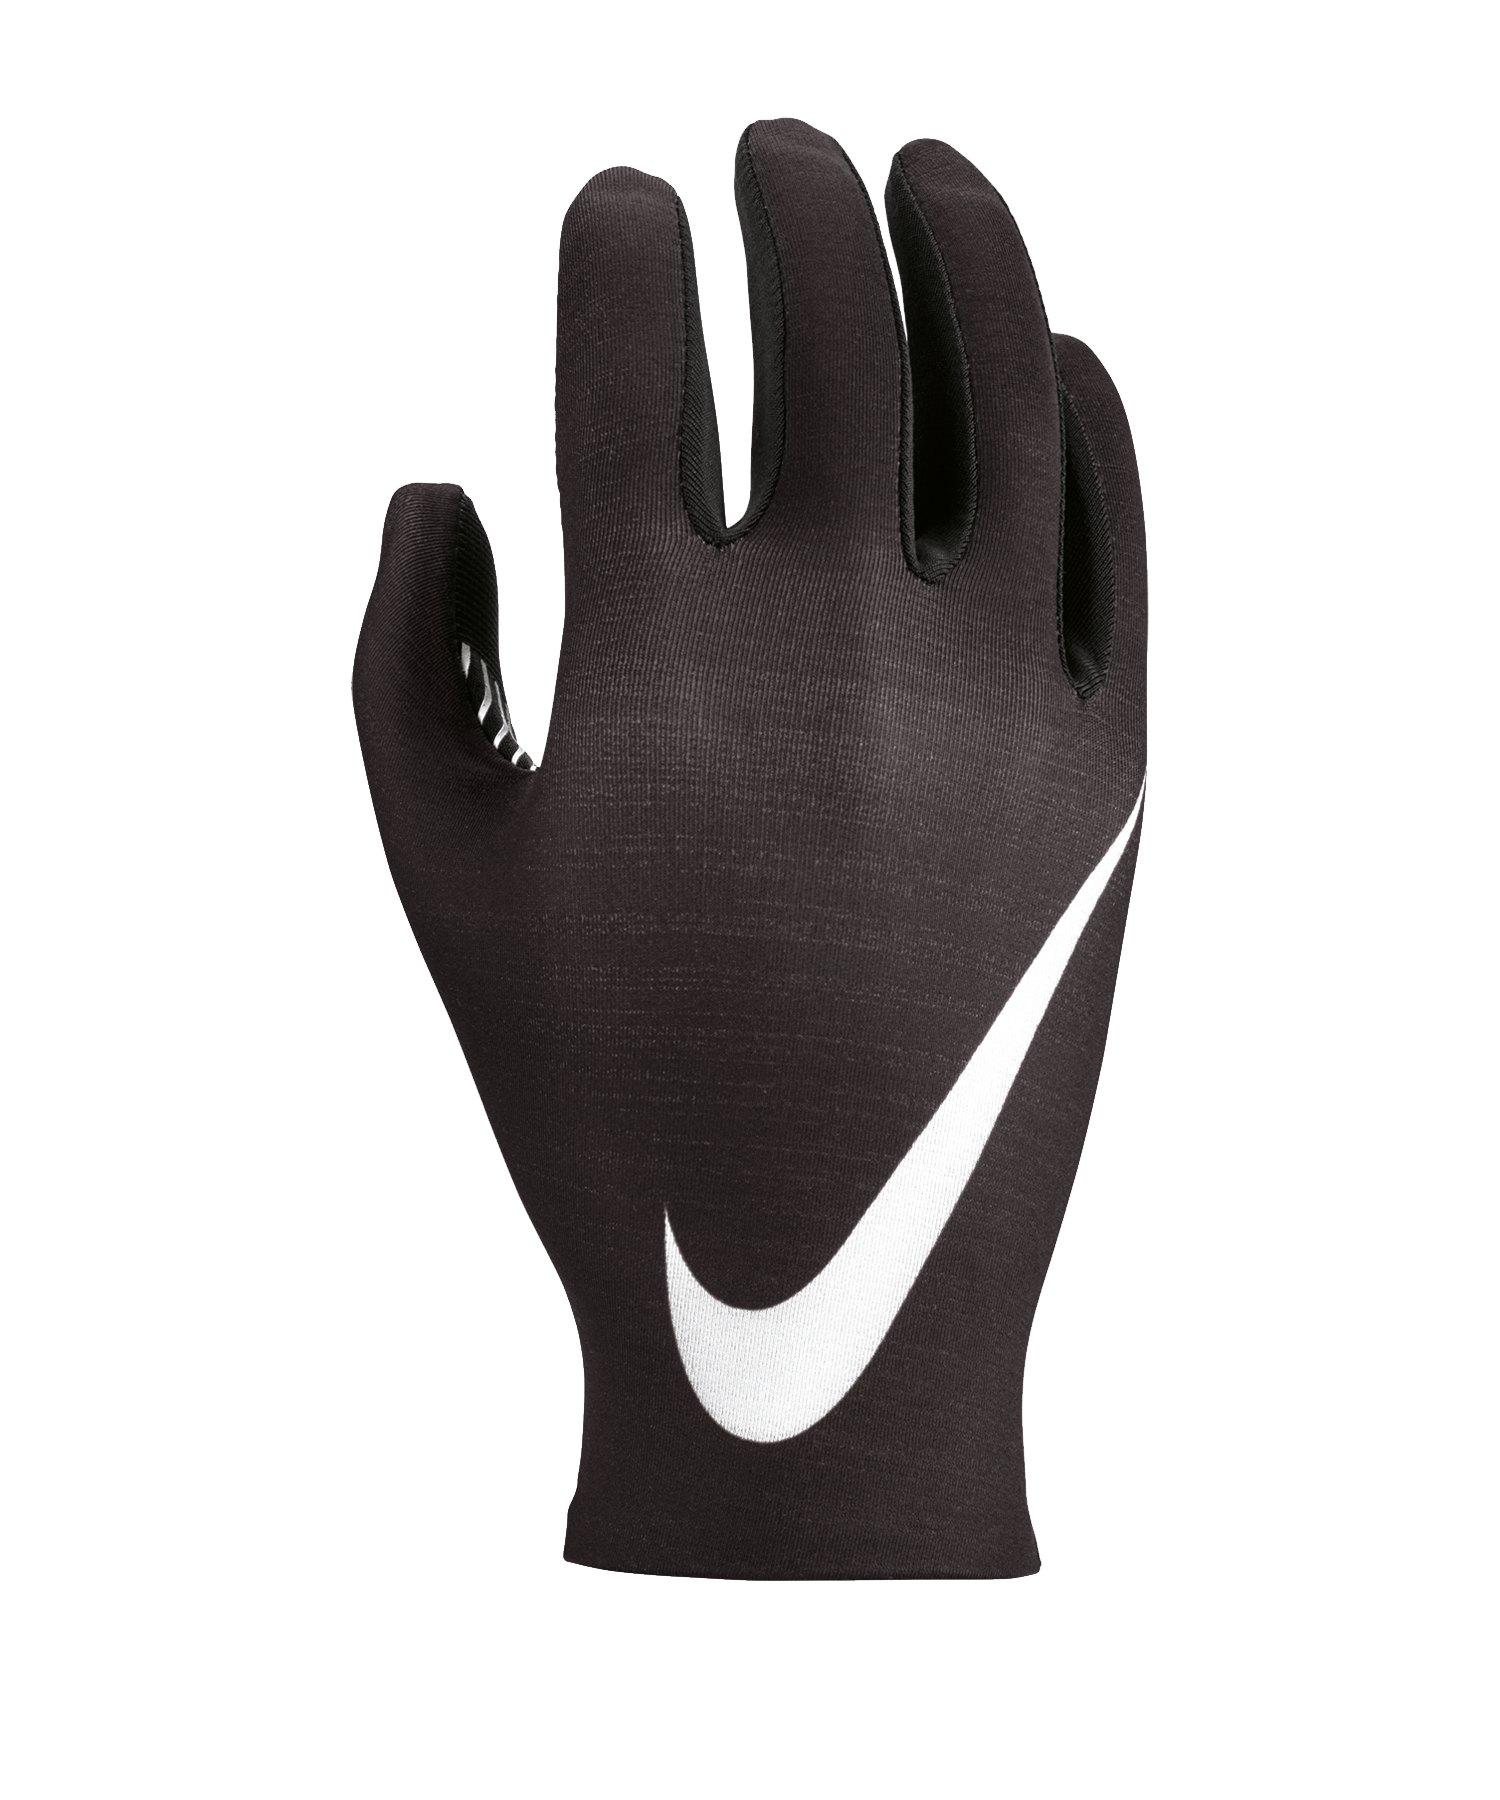 Nike Base Layer Handschuhe Running Damen F017 - schwarz